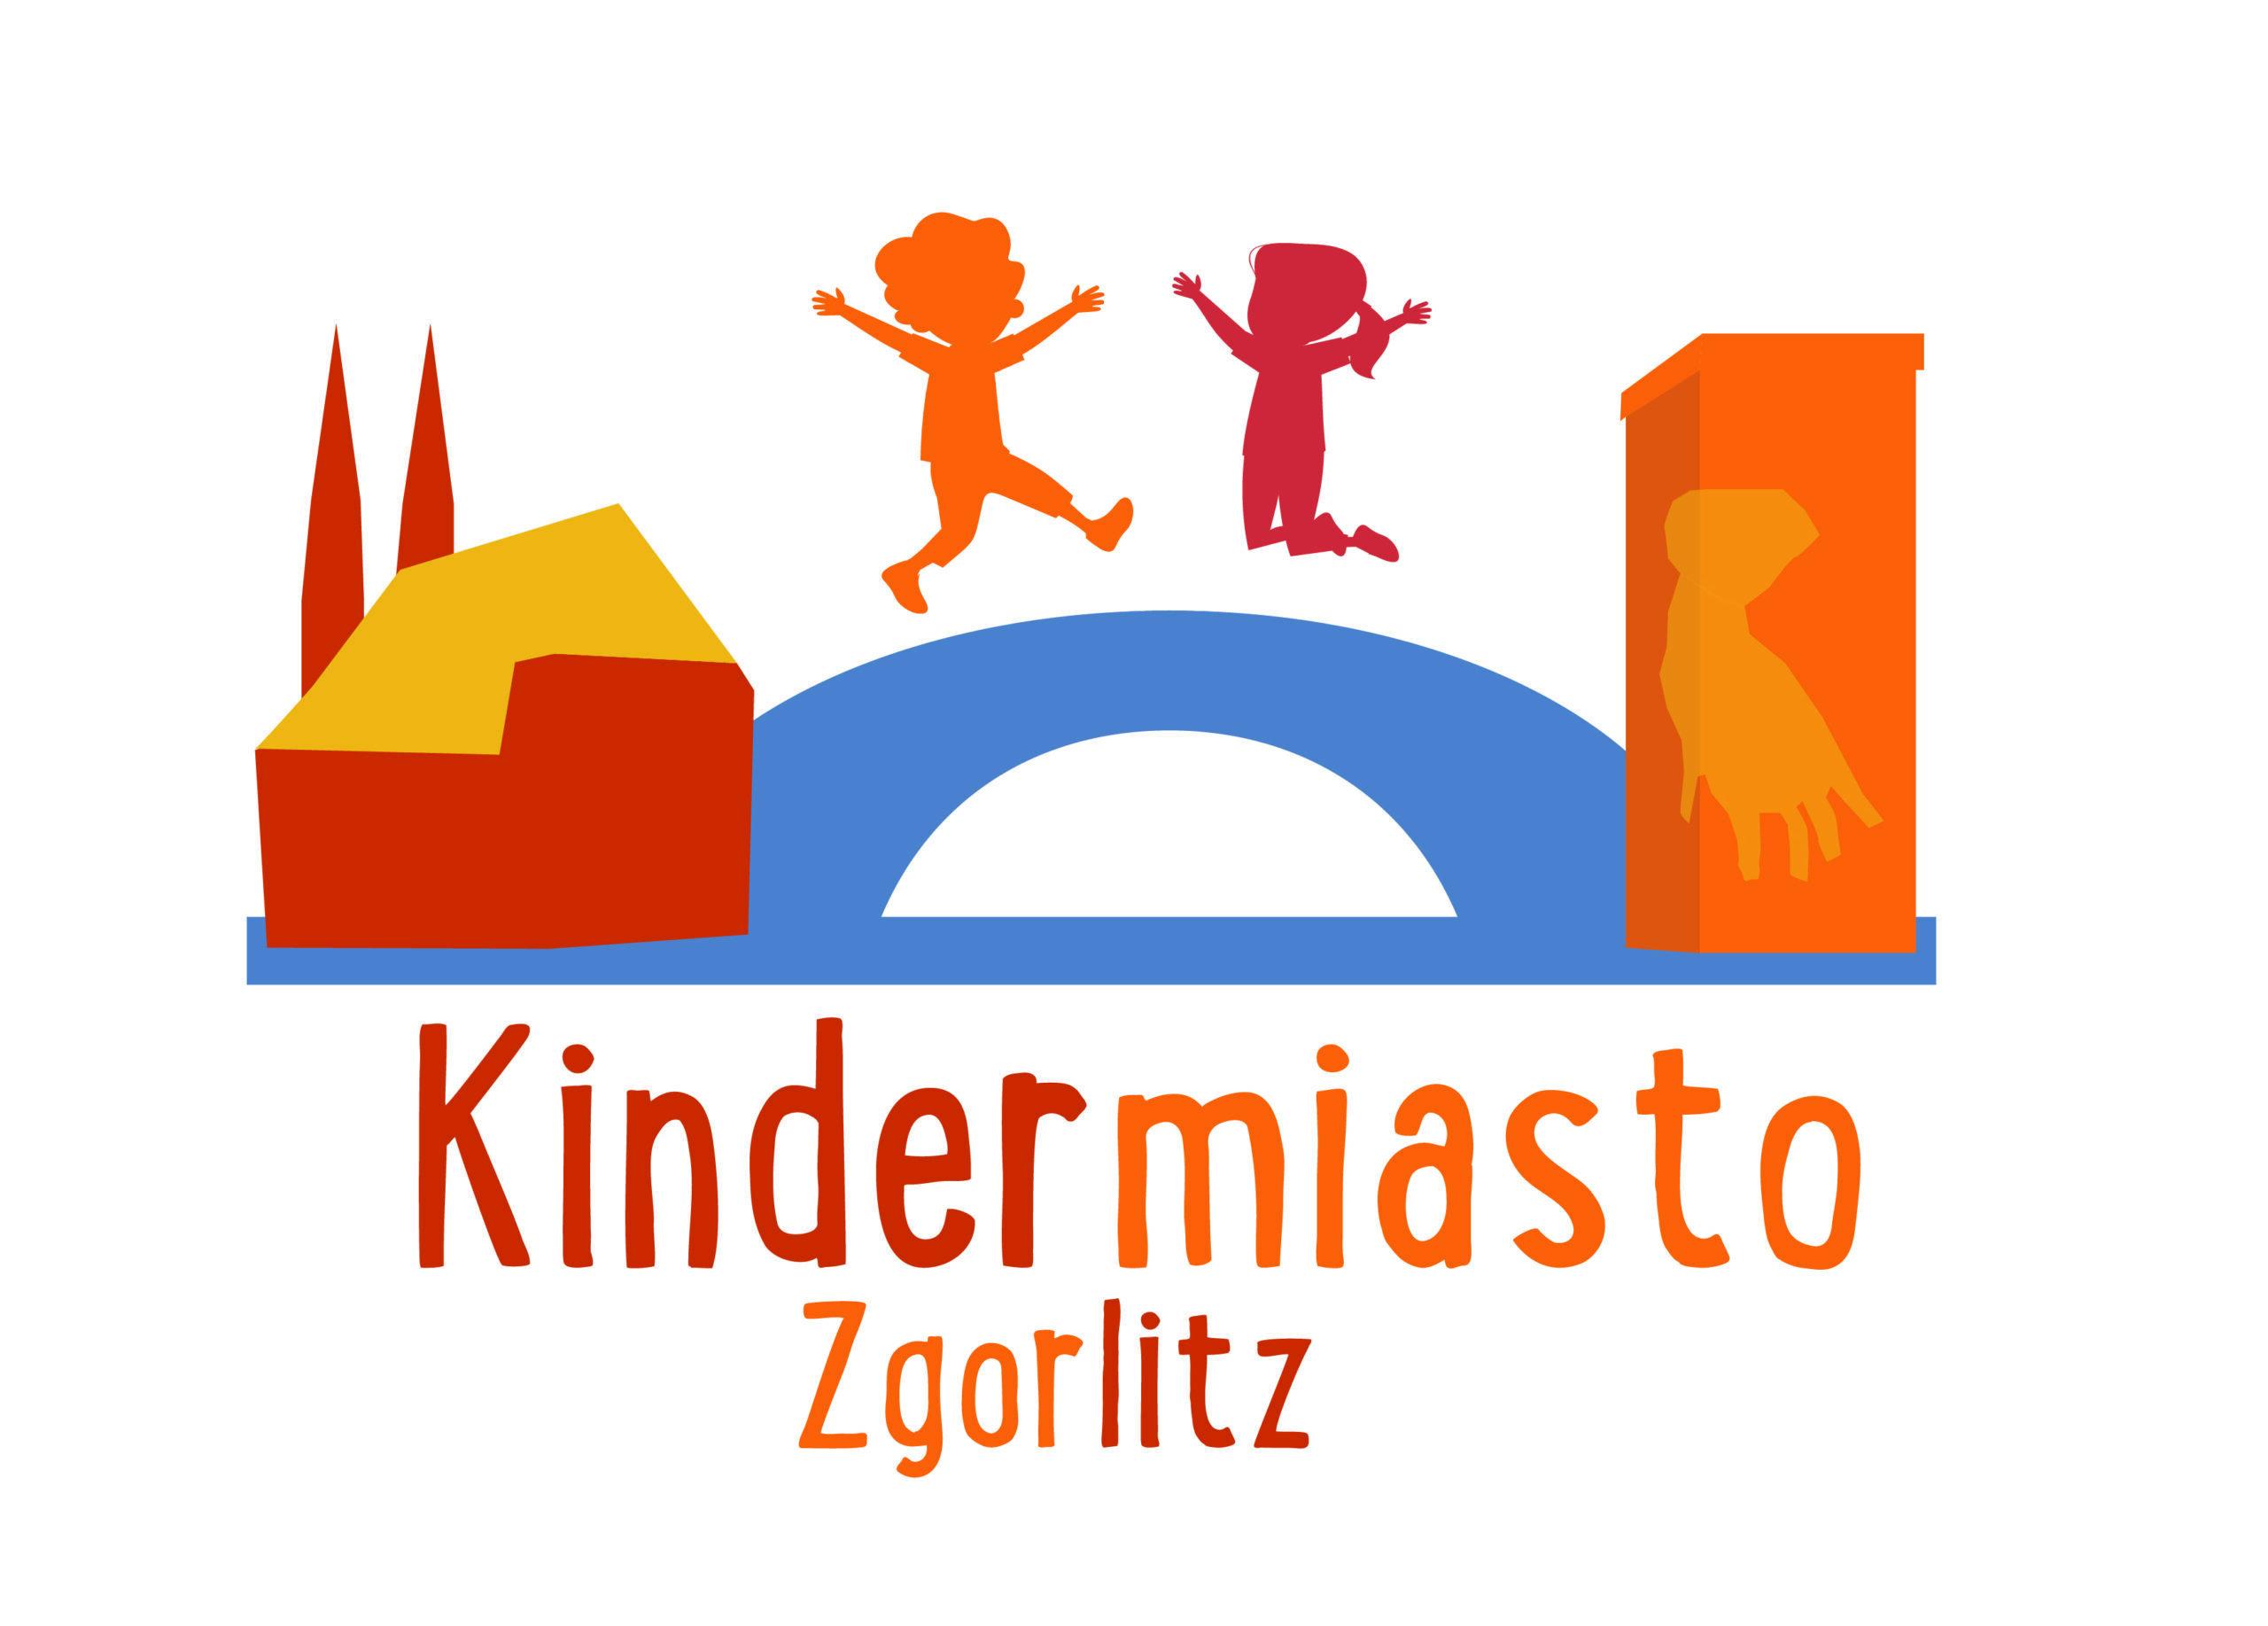 Kindermiasto Zgorlitz